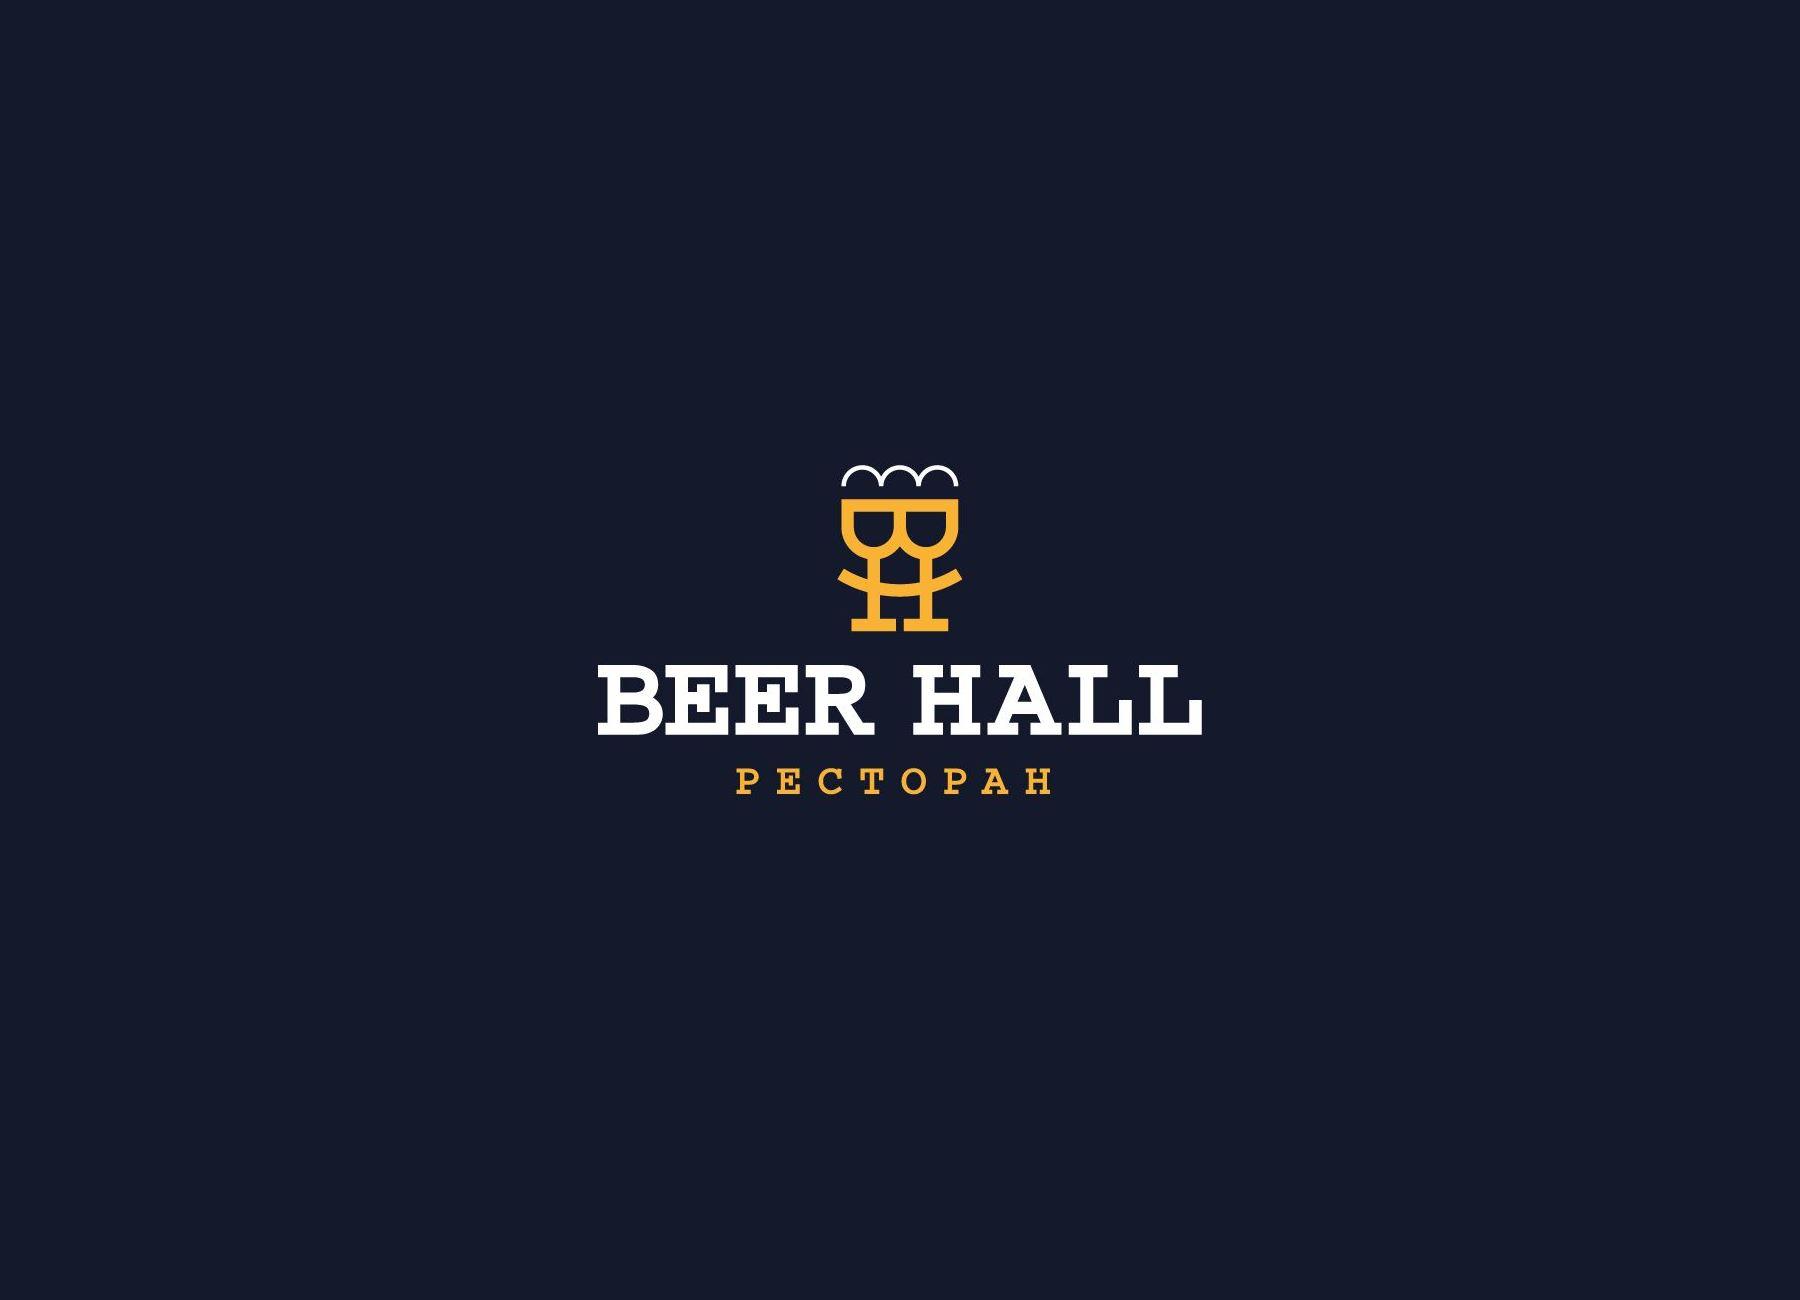 Beer Hall - логотип для ресторана